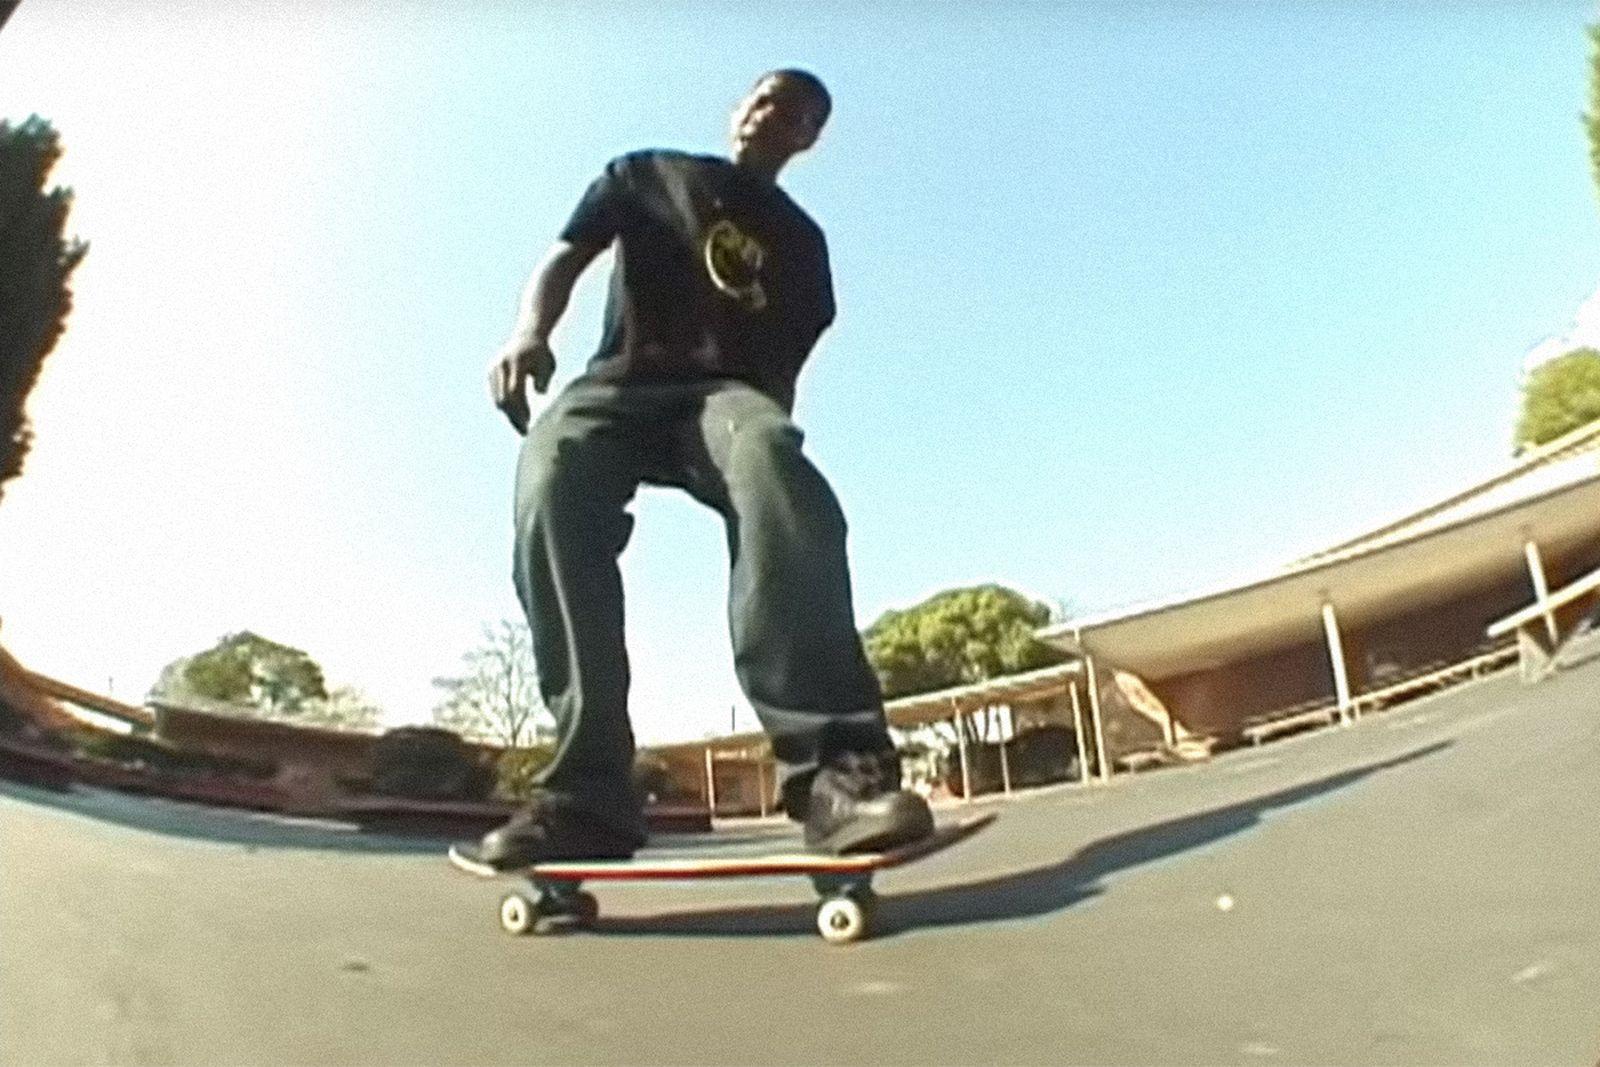 free-skate-videos-main